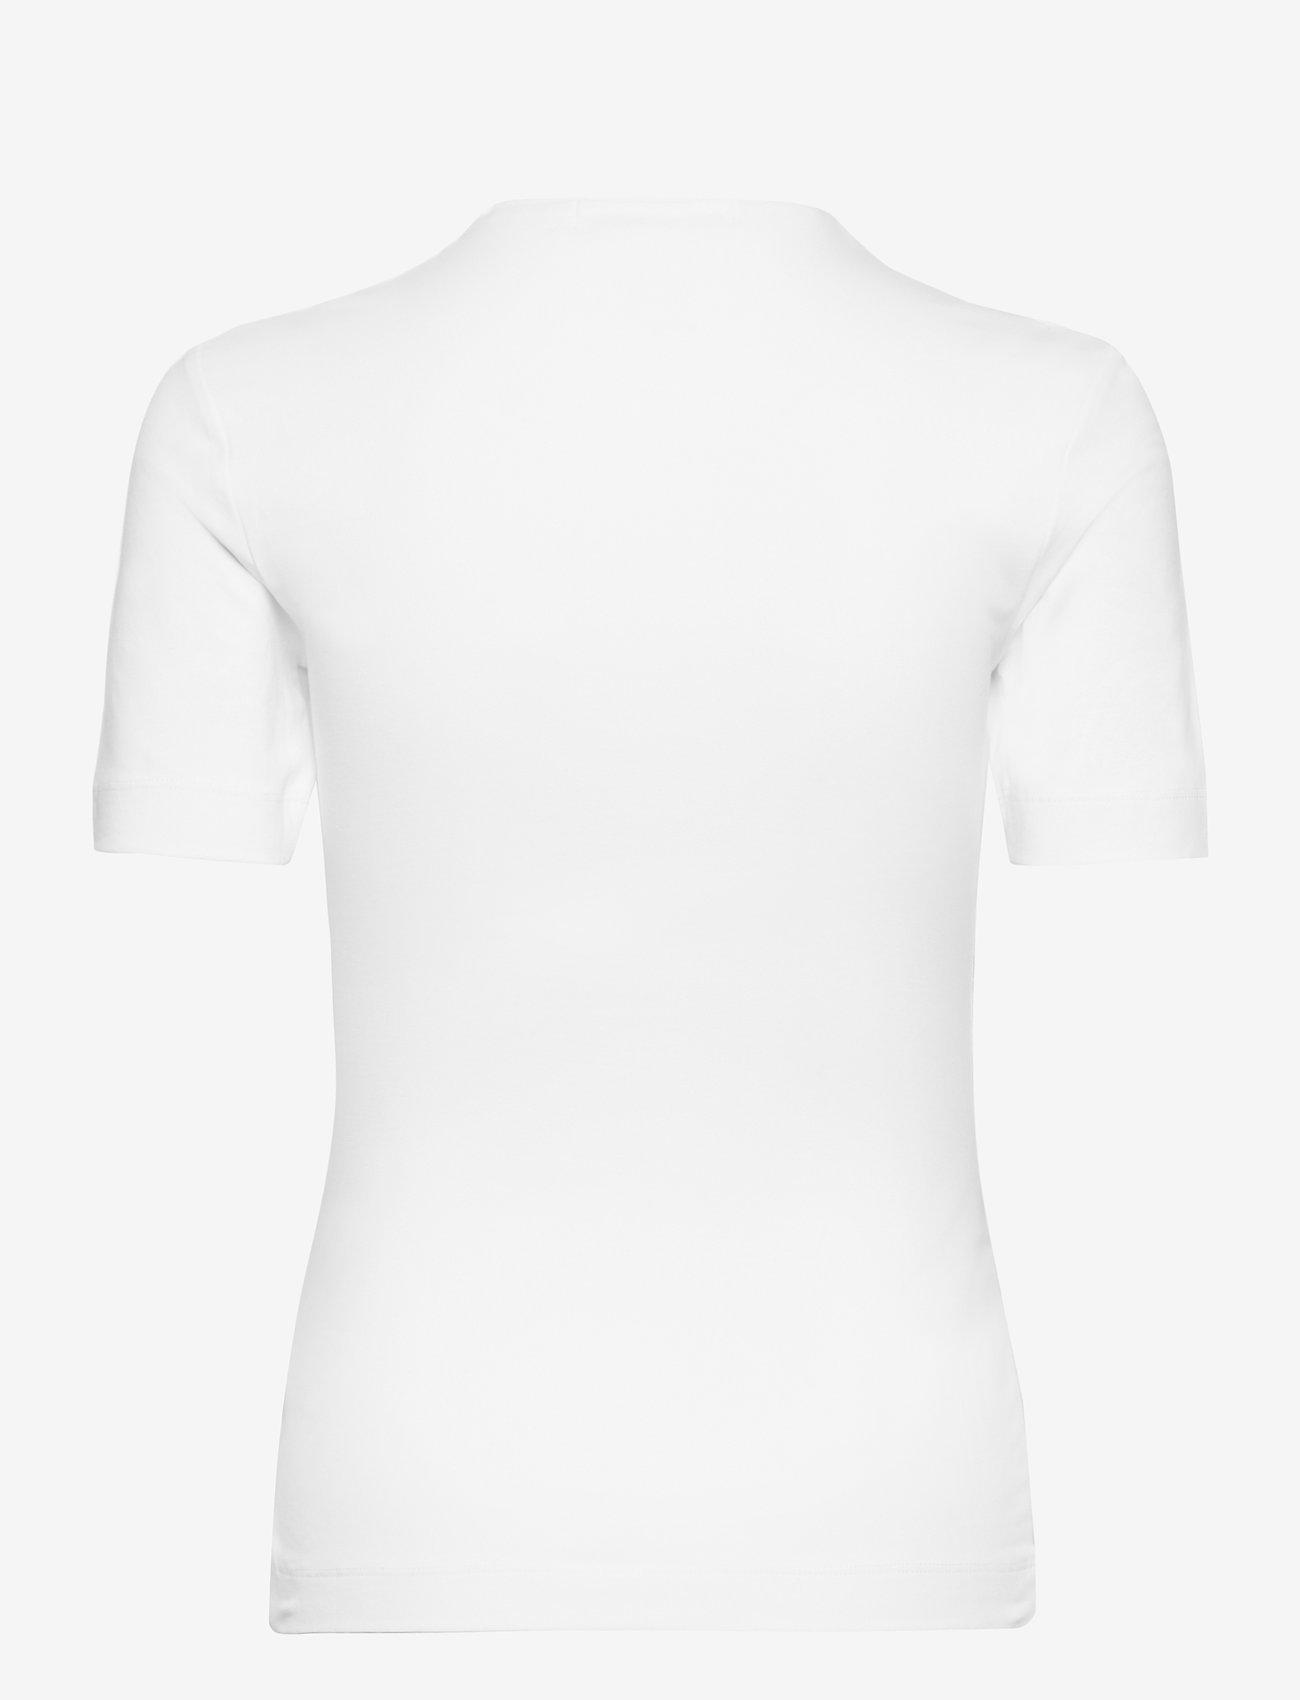 Calvin Klein Jeans - MICRO BRANDING STRETCH MOCK NECK - t-shirts - bright white - 1